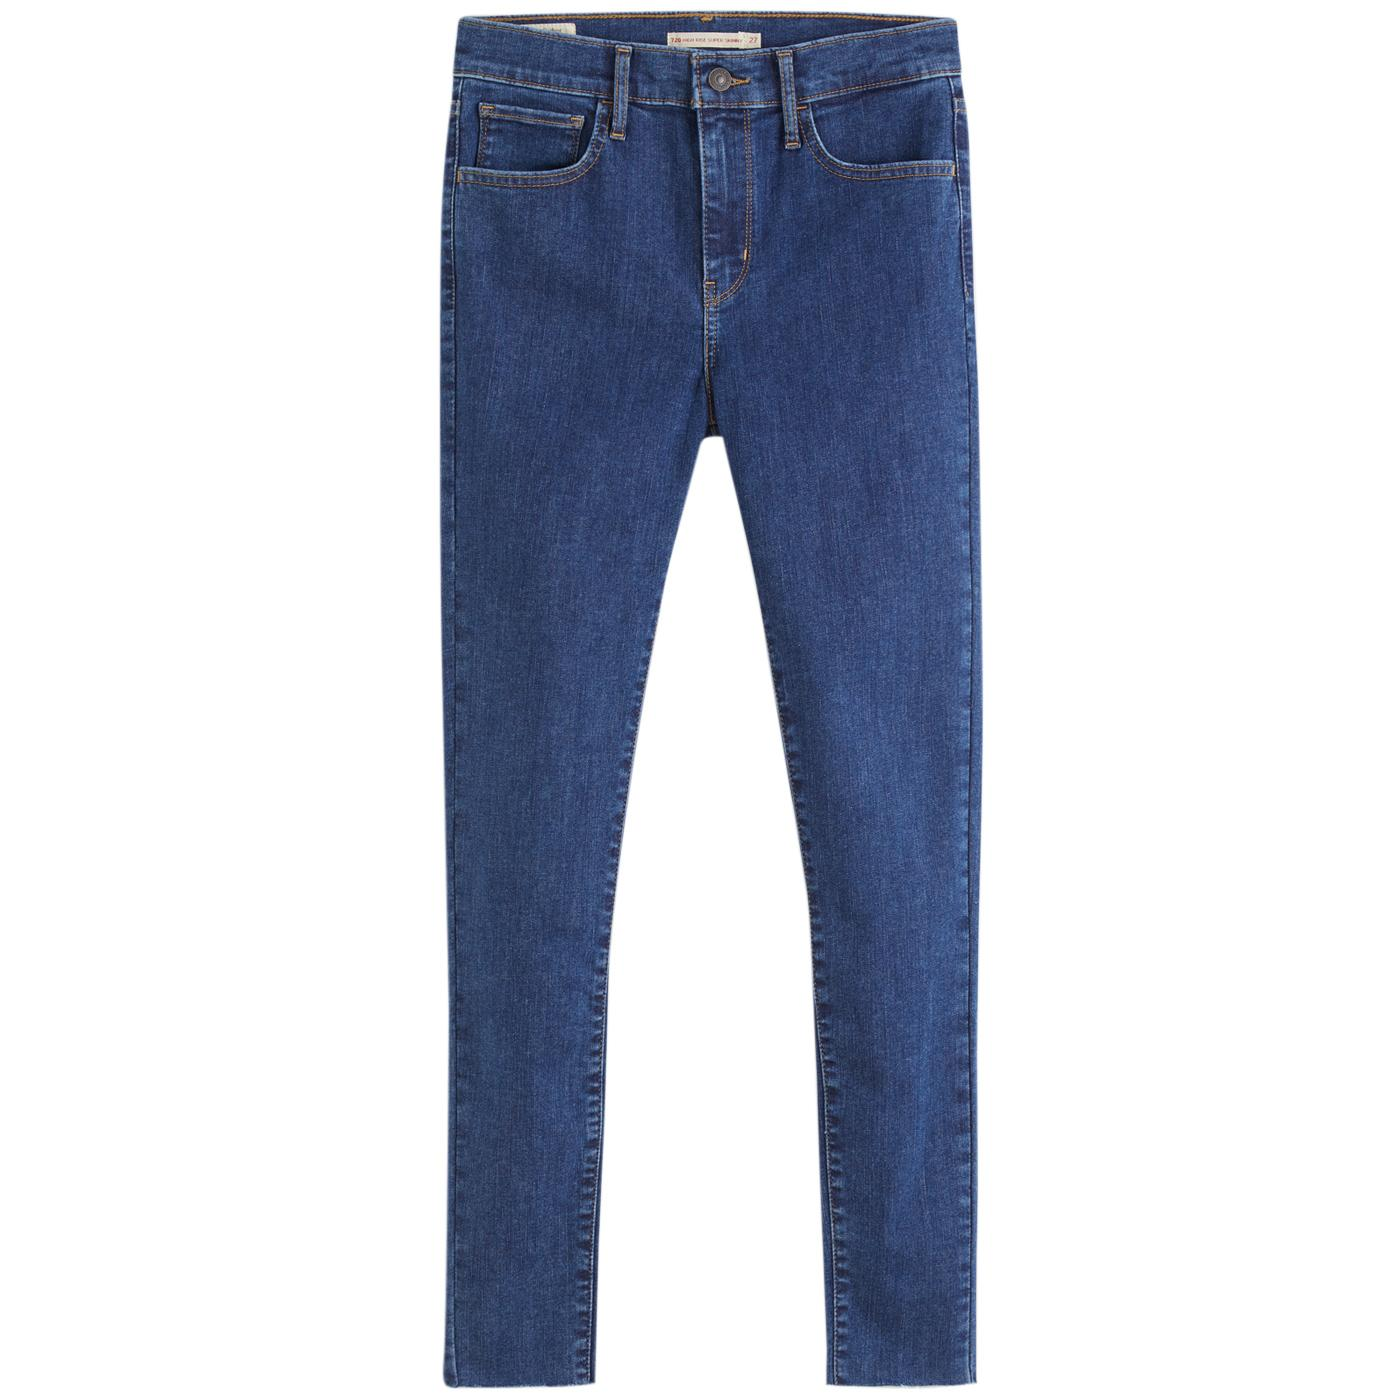 LEVI'S 720 High-Rise Super Skinny Jeans (ES)